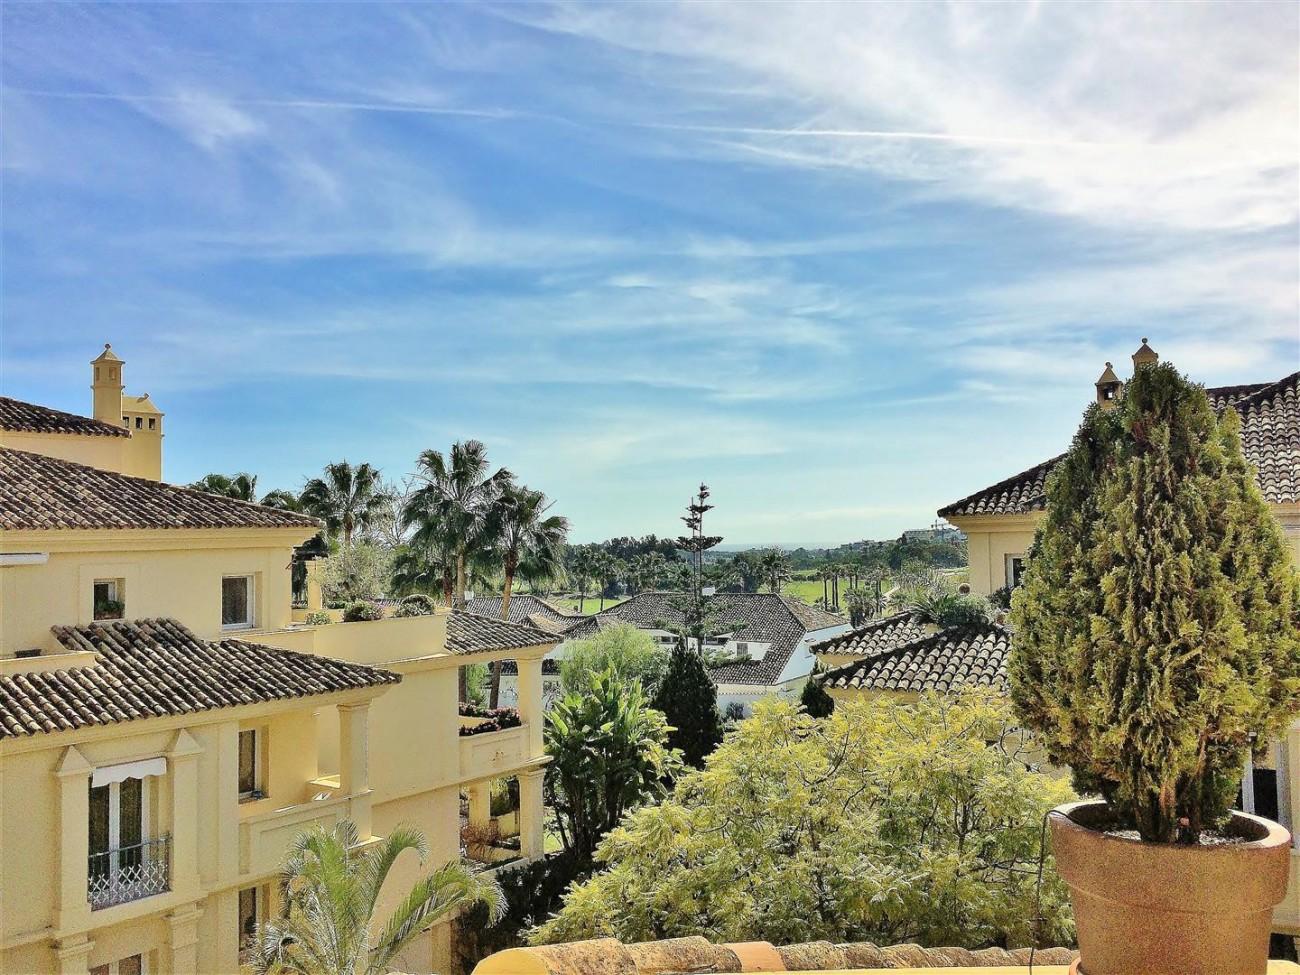 Penthouse for sale Las Alamandas Nueva Andalucia Marbella Spain (16) (Large)